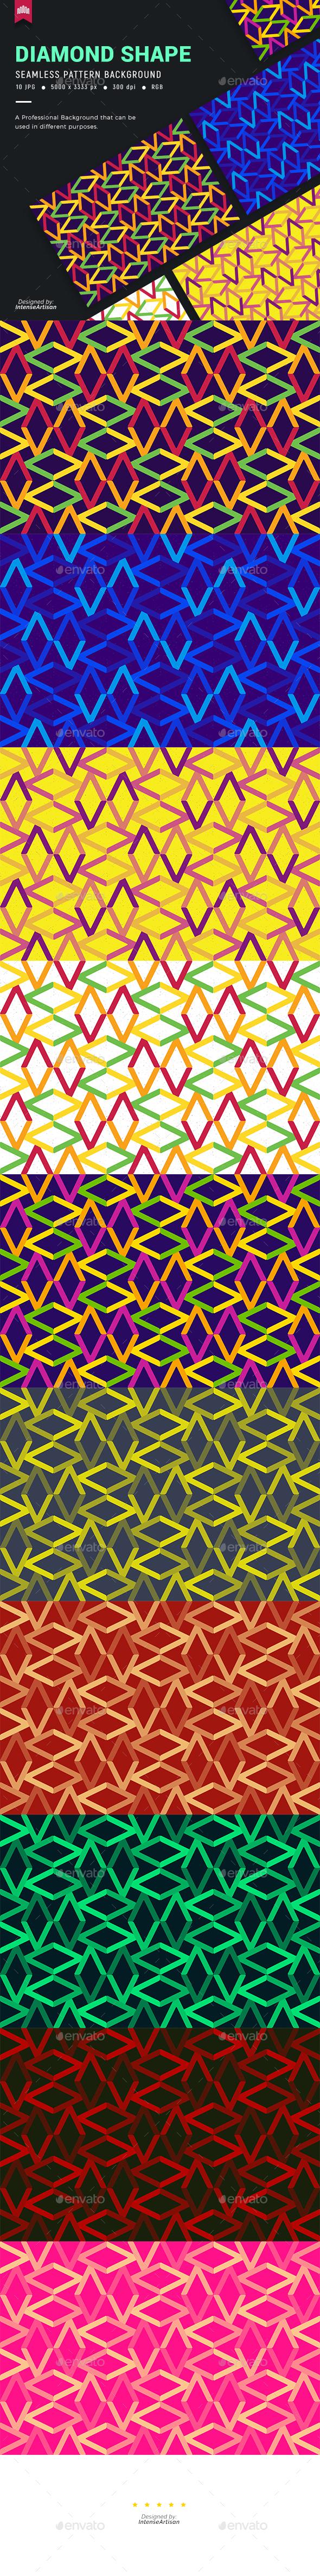 Diamond Shape Seamless Pattern Background - Patterns Backgrounds